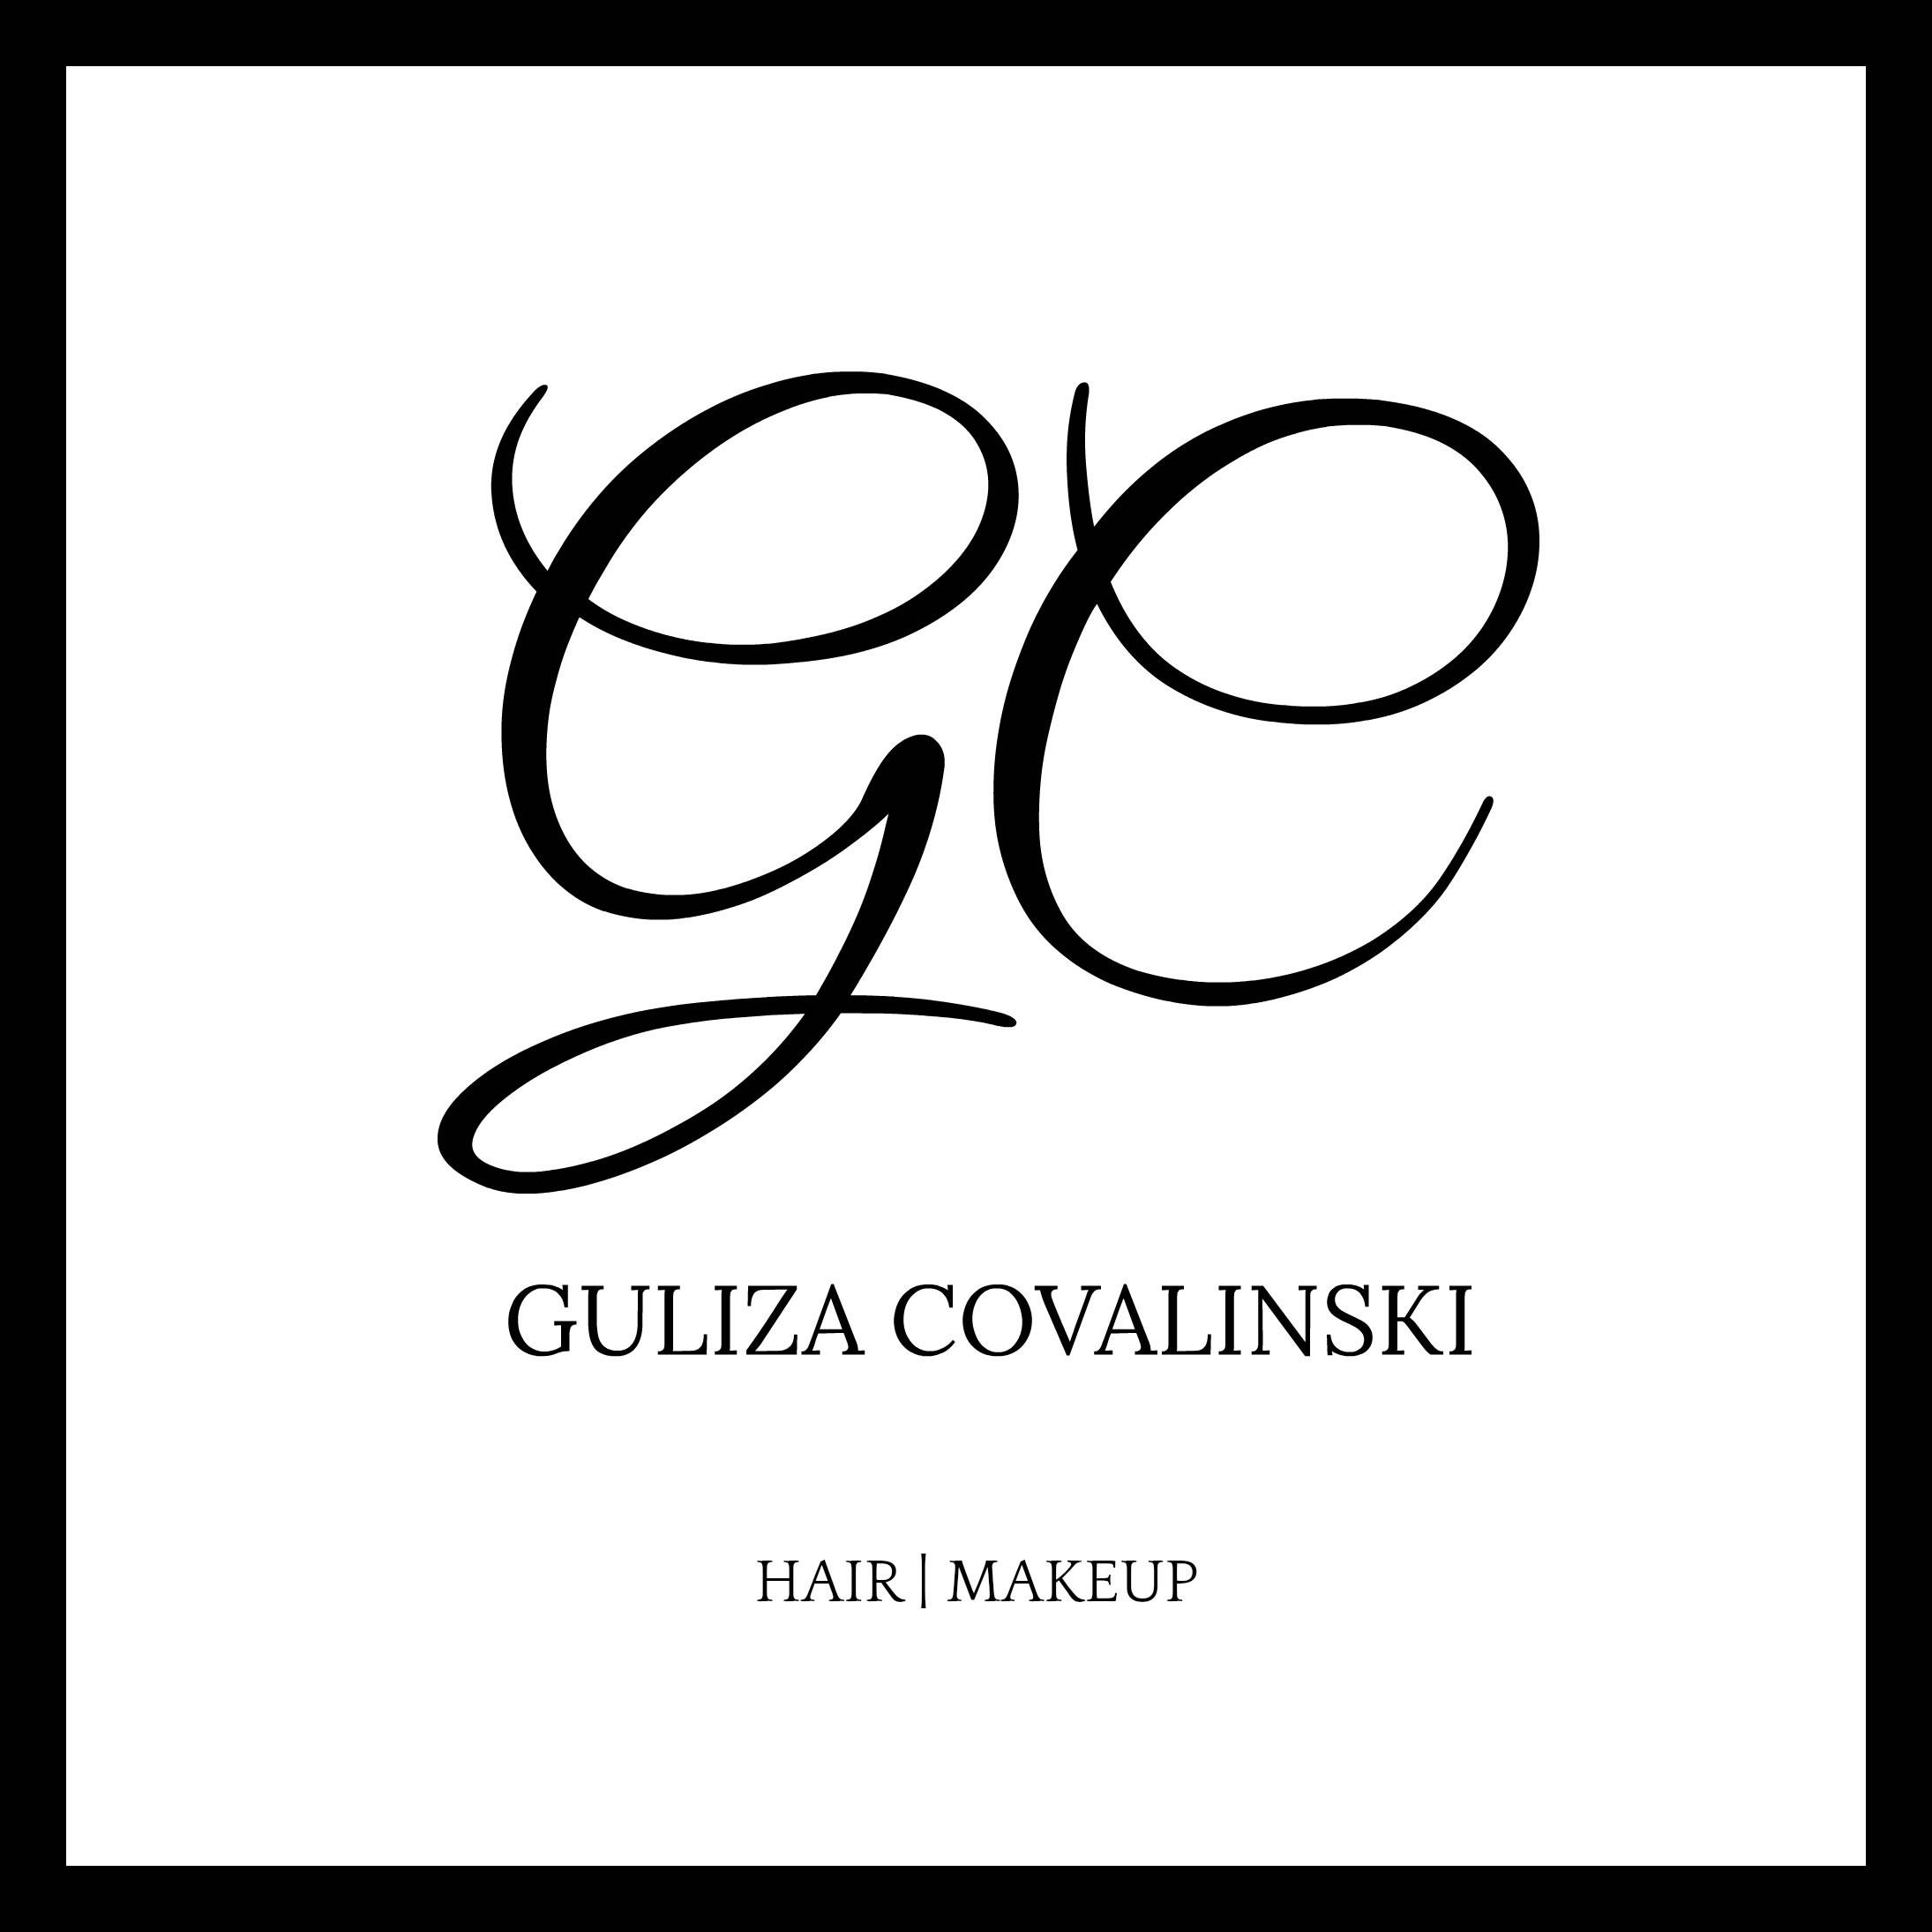 Guliza Covalinski